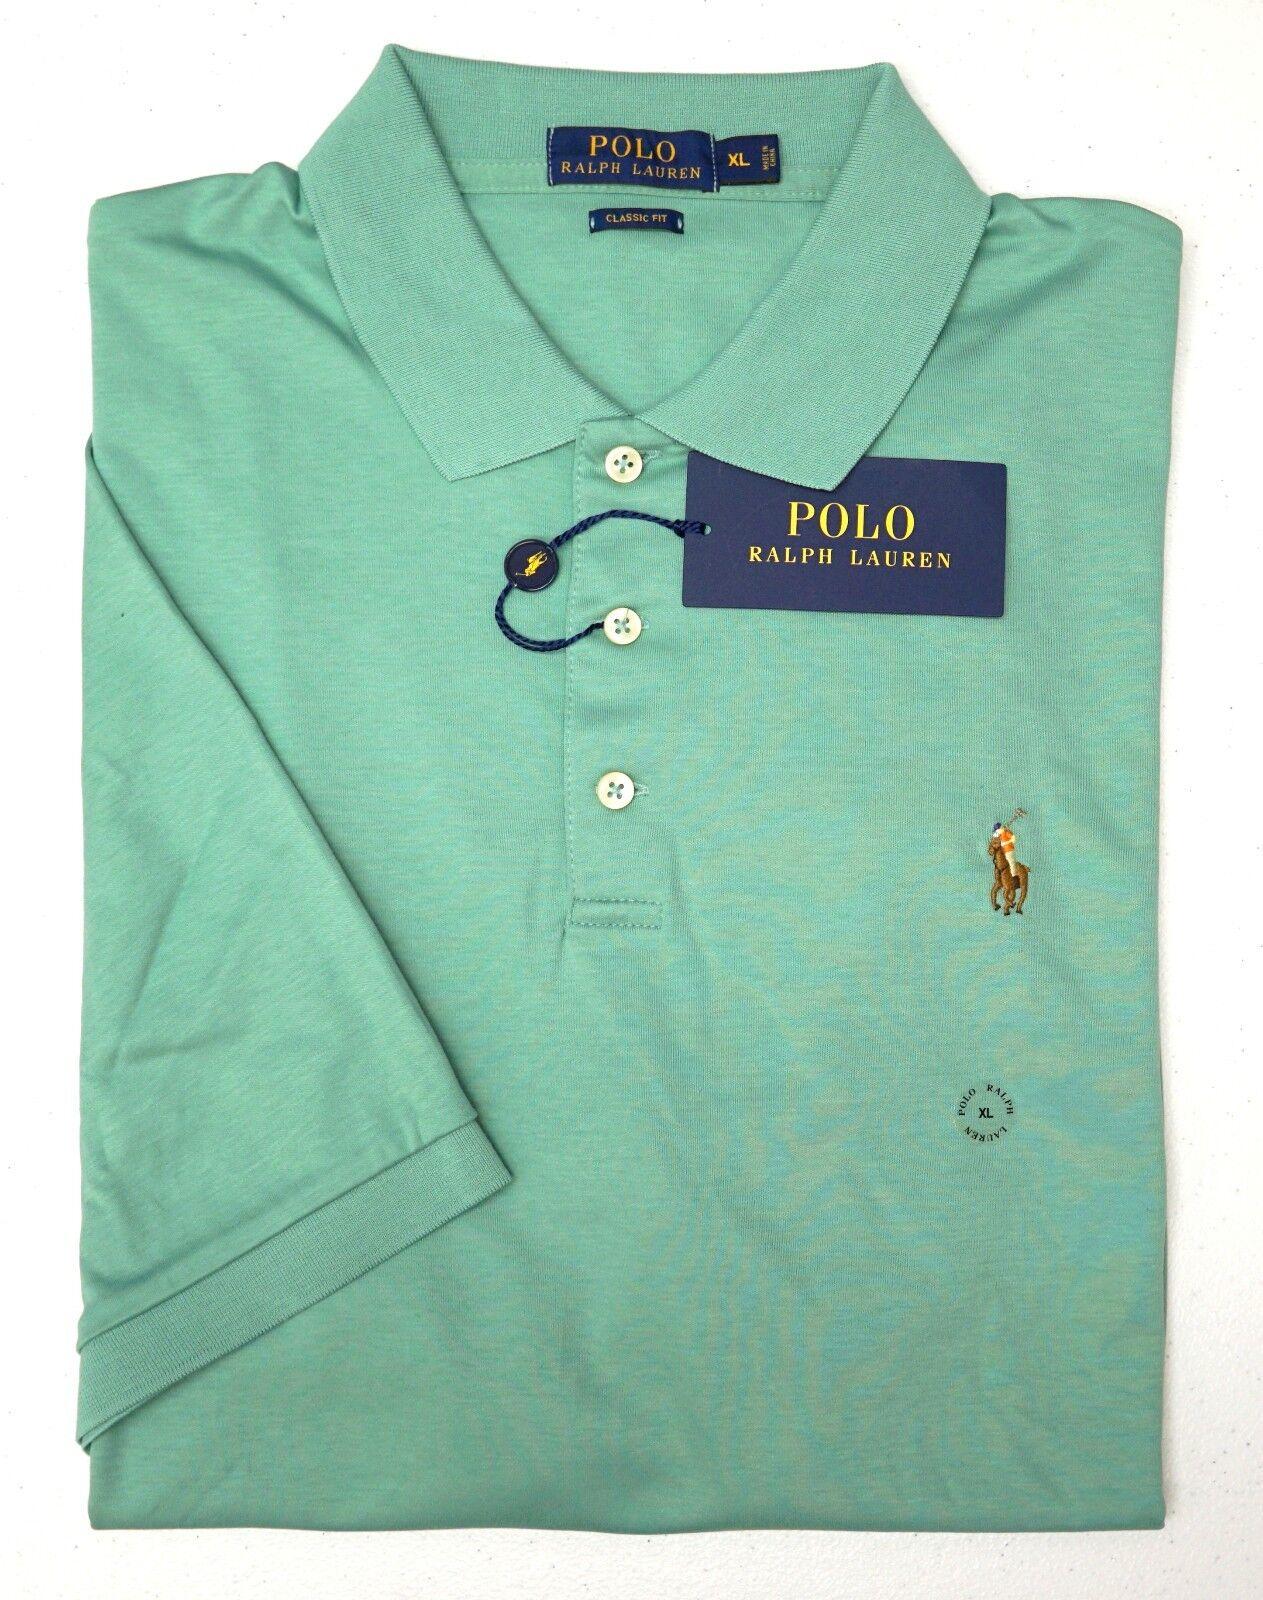 NWT  Polo Ralph Lauren Green SS Classic Fit Shirt Mens Size XL XXL Cotton NEW